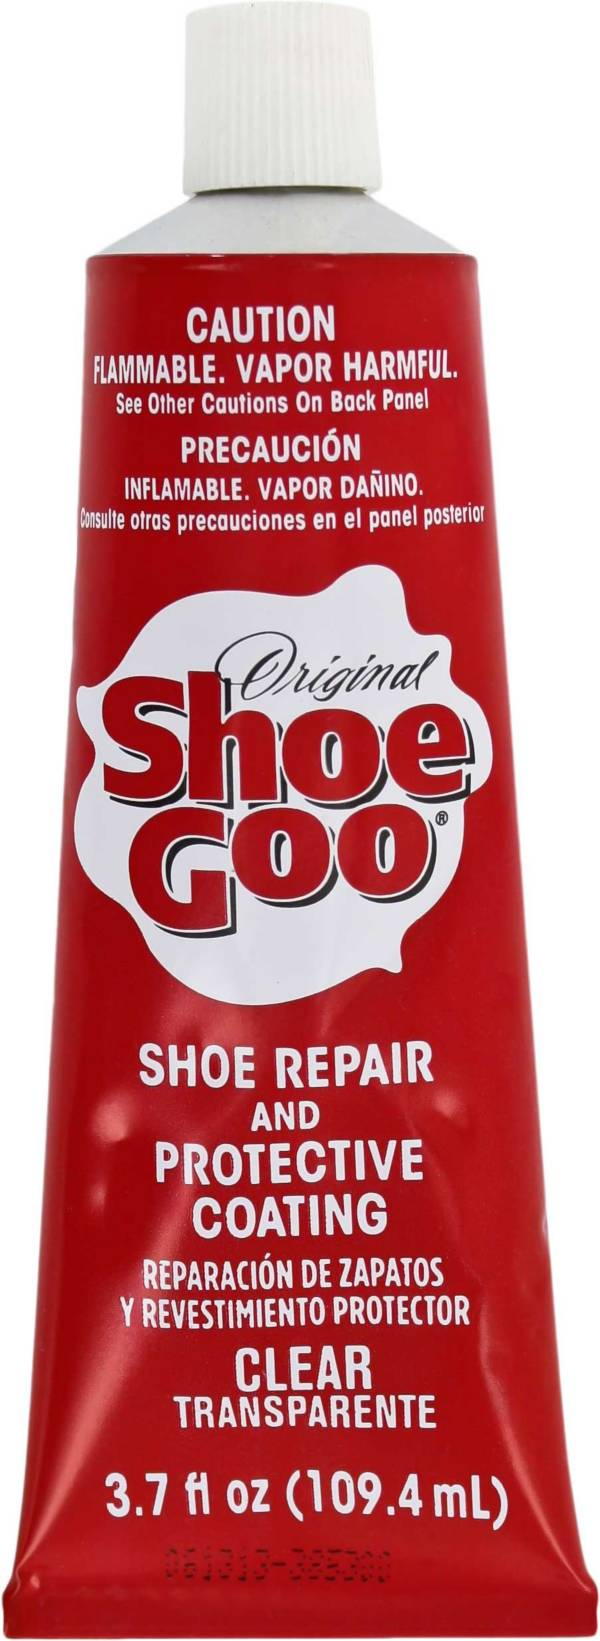 Implus Footcare Shoe Goo product image